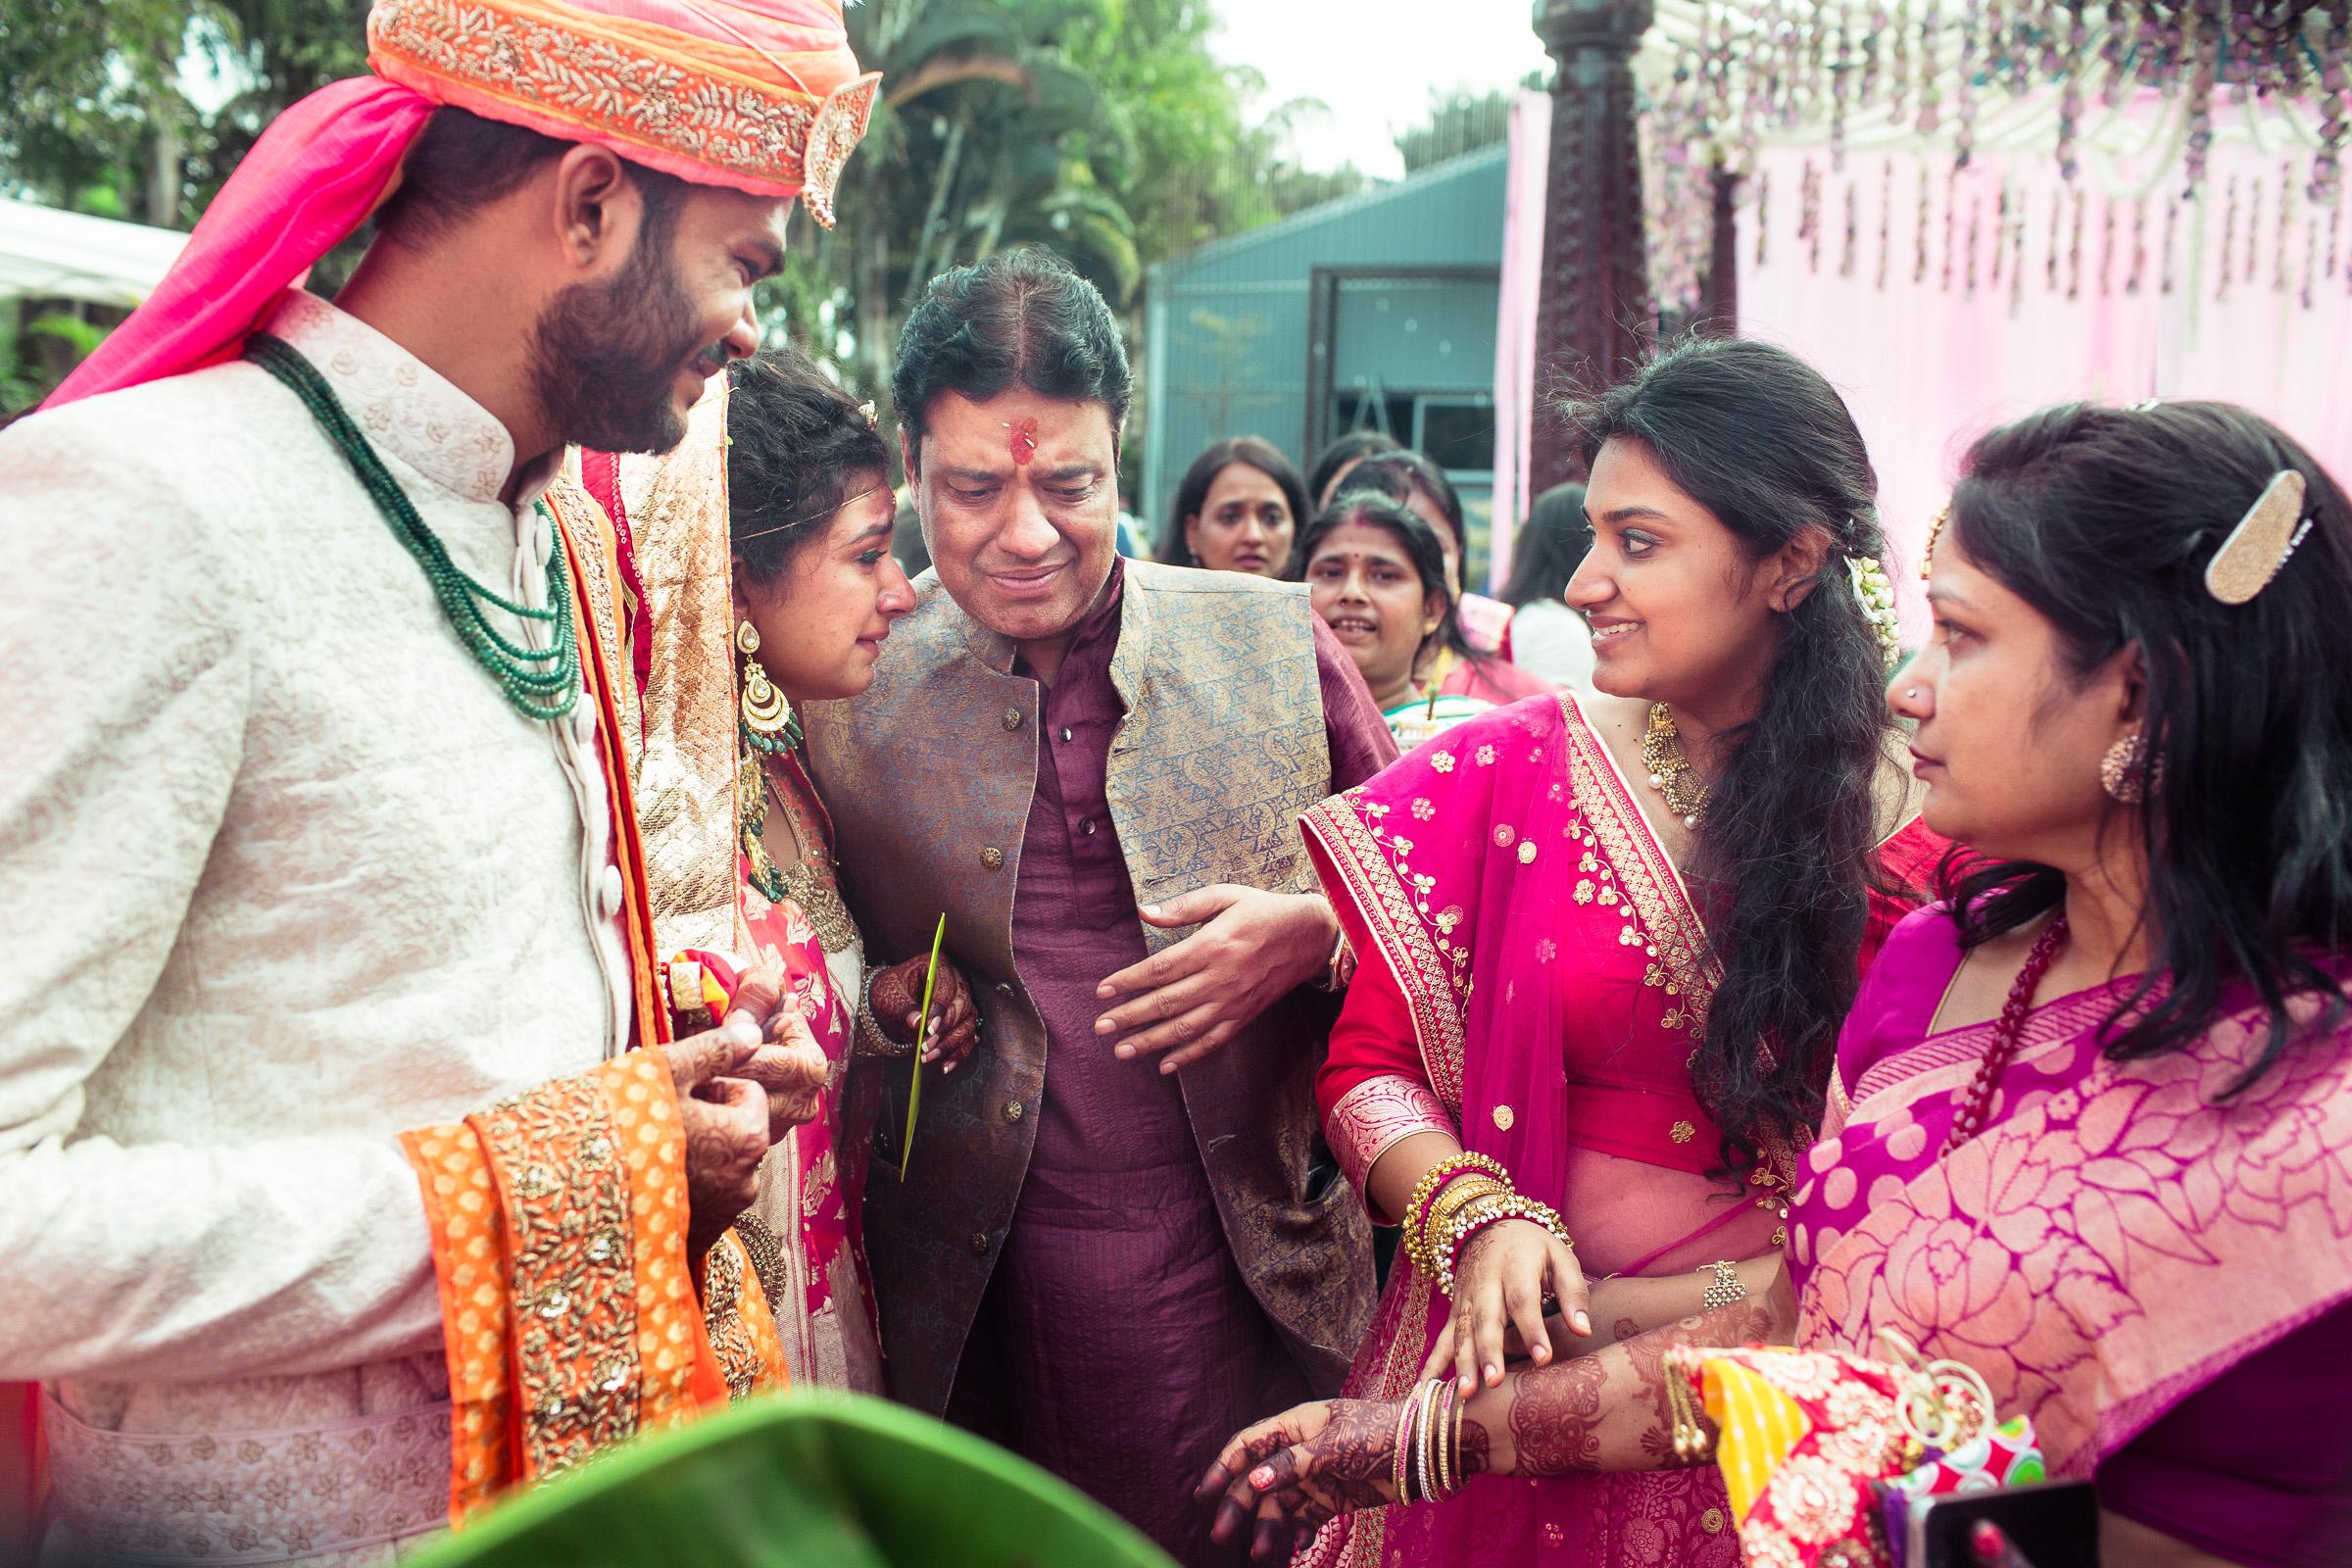 marwari-candid-wedding-photographers-bangalore-0051.jpg